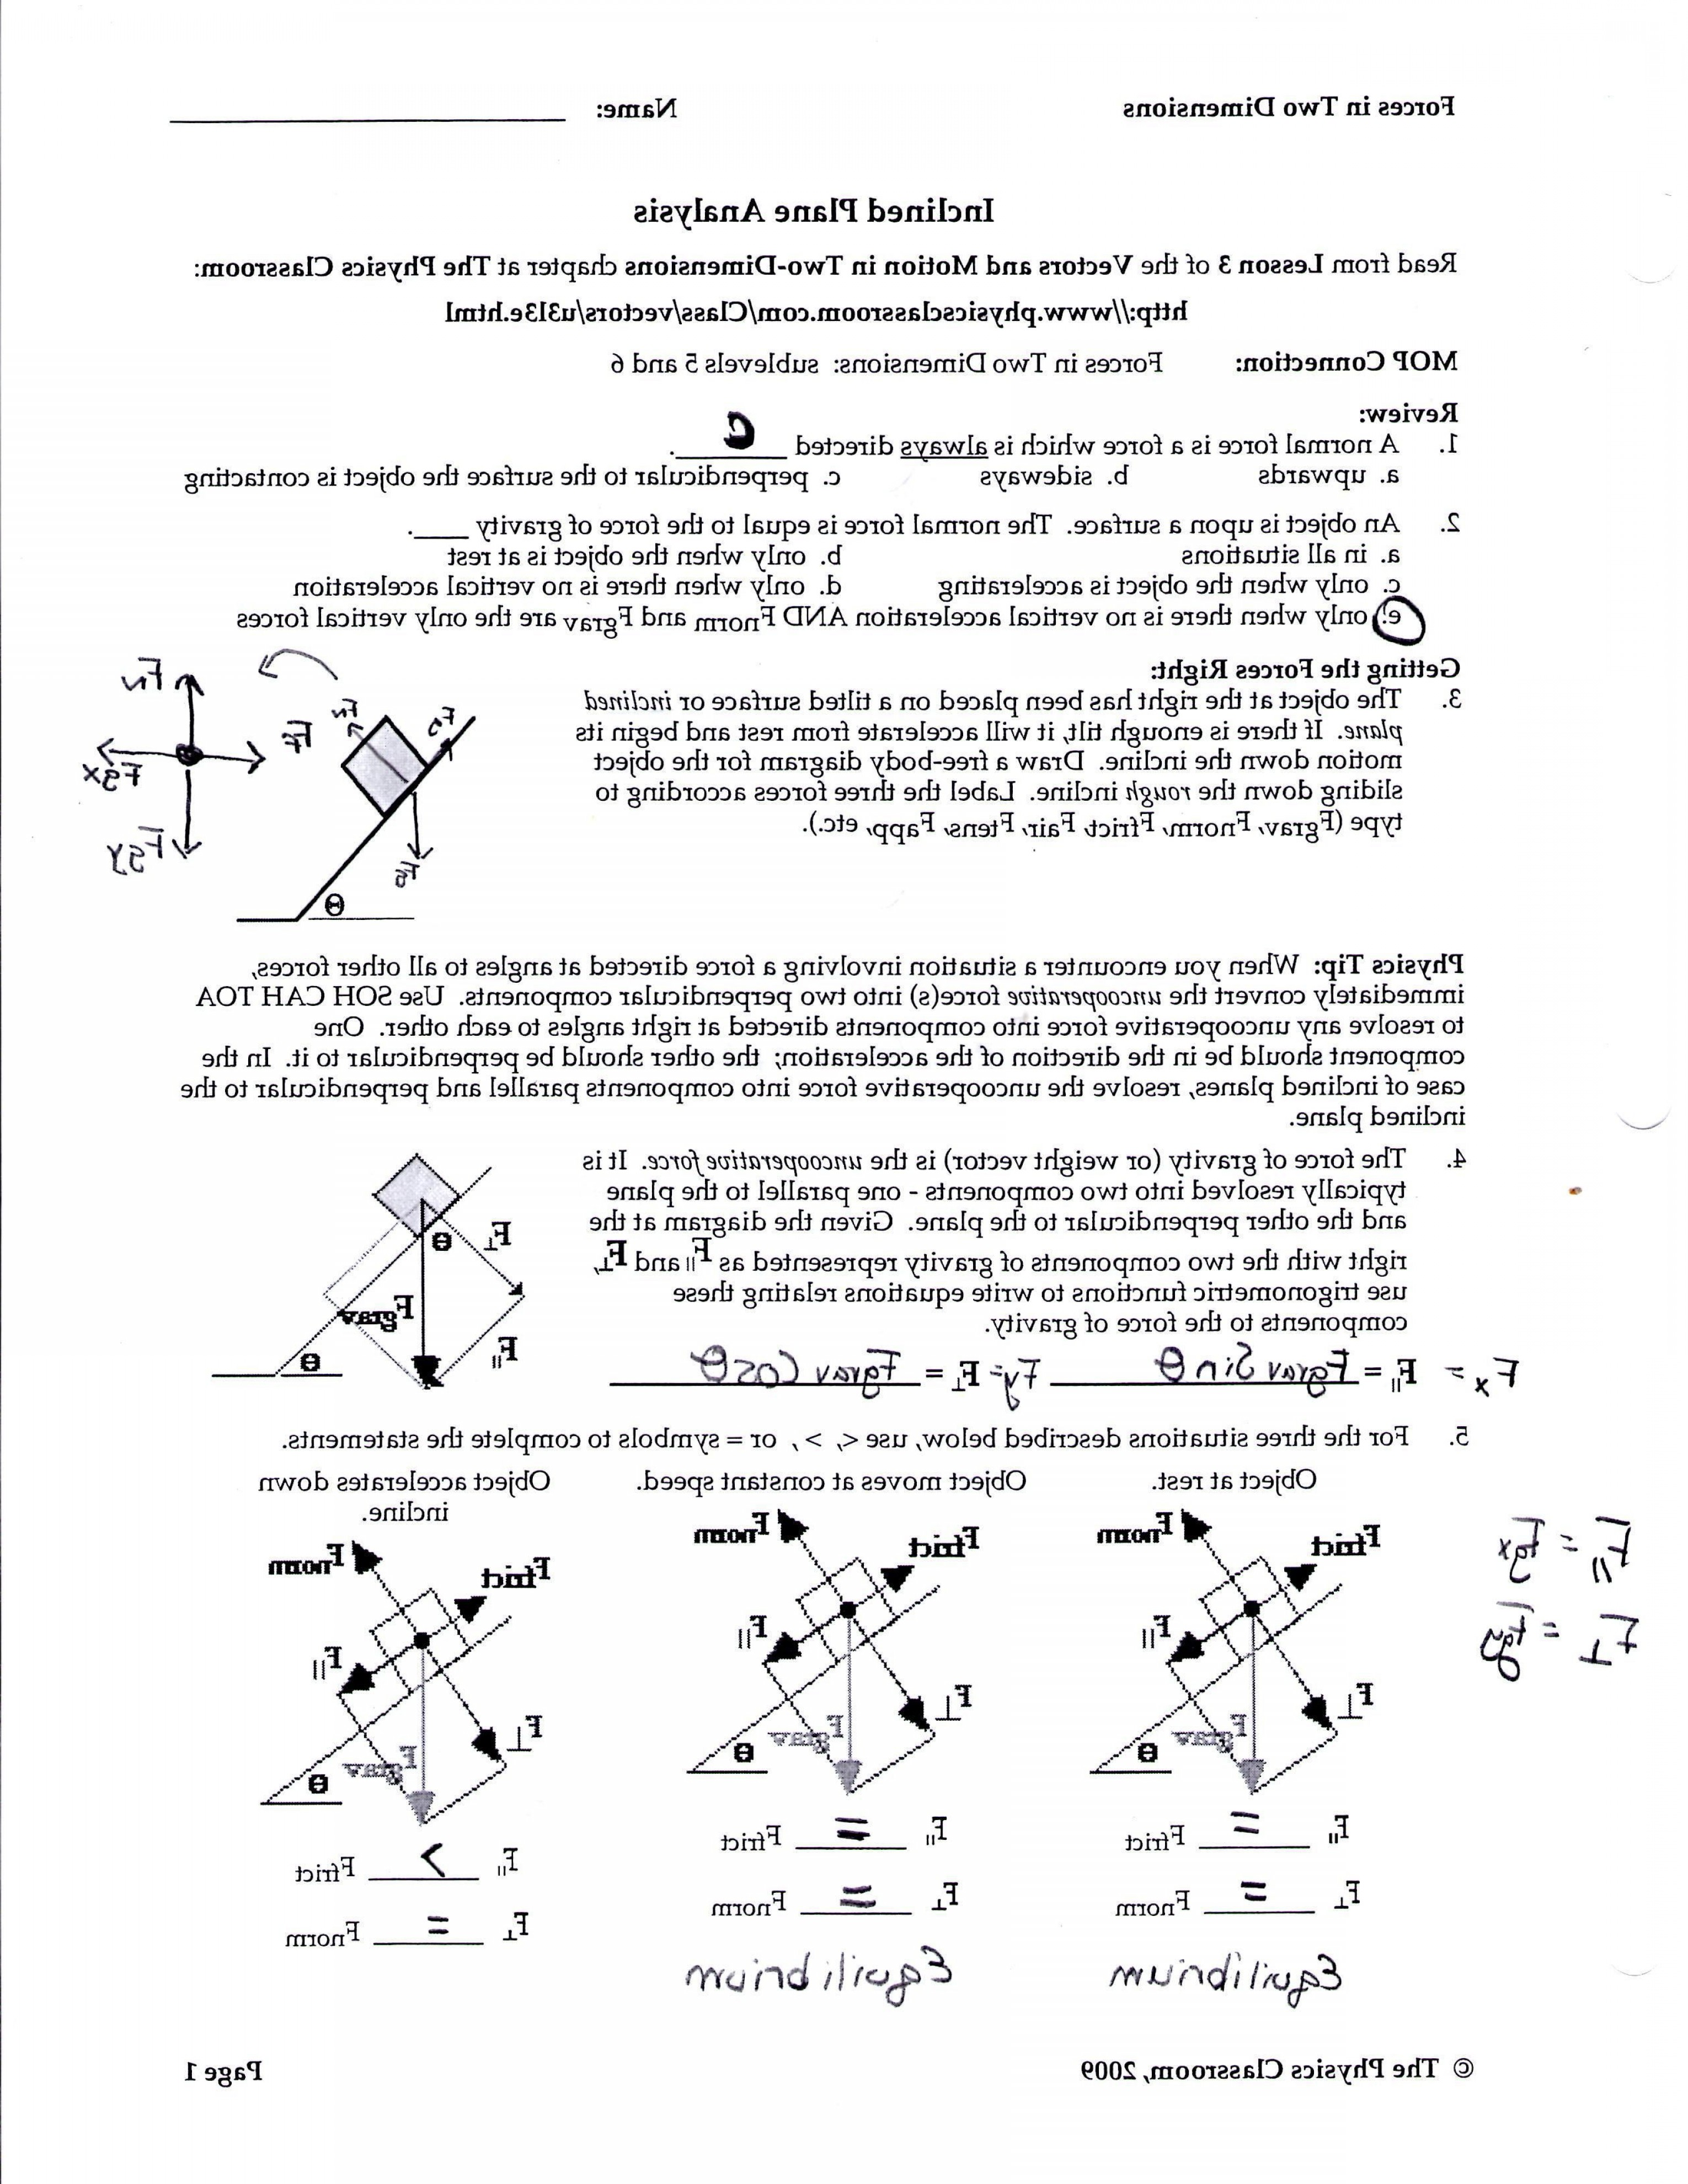 Kv 8141 To Freebody Diagrams Gt Practice Drawing Freebody Diagrams Wiring Diagram